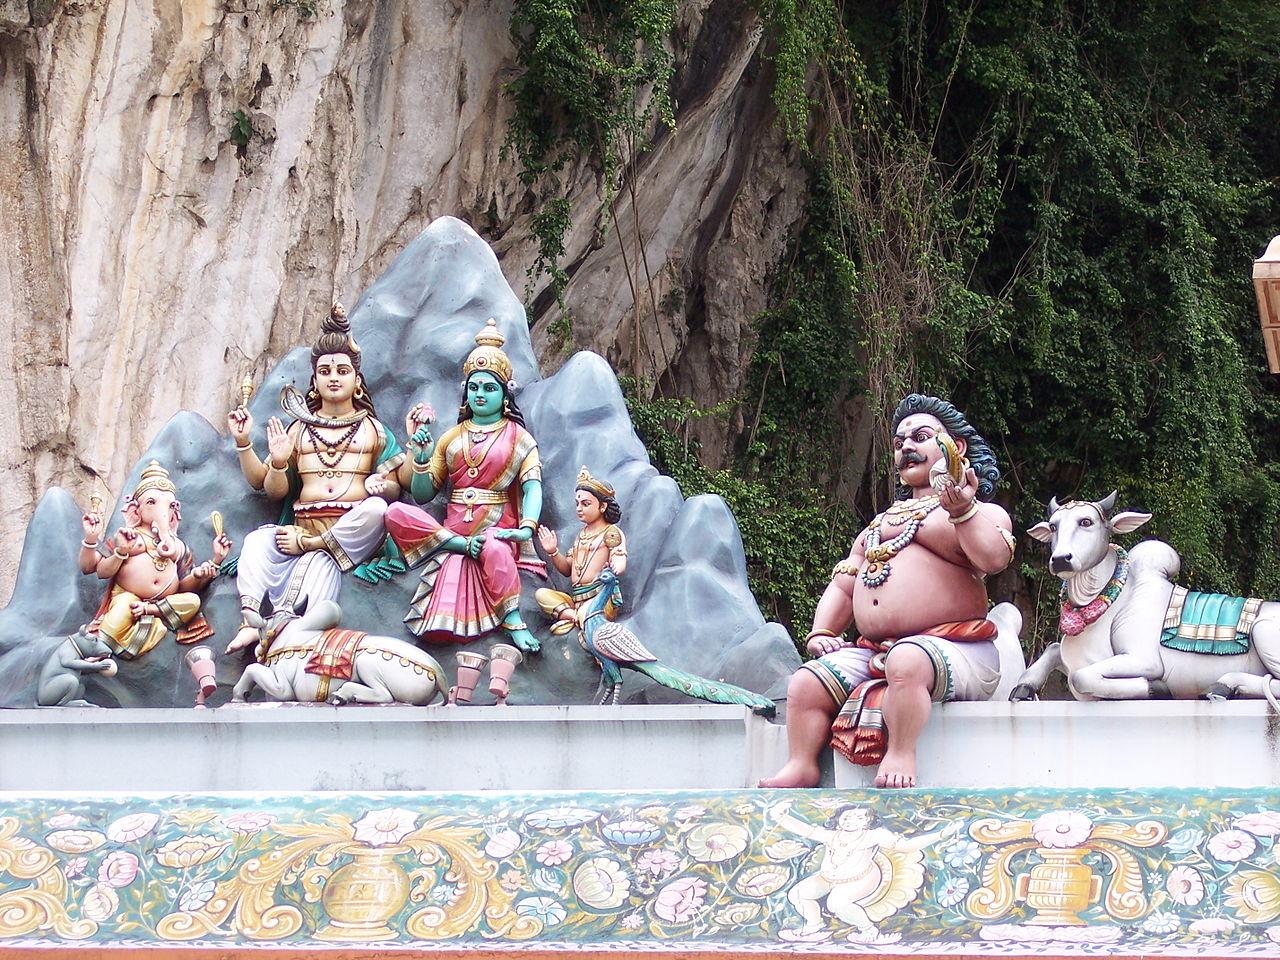 Пещеры Бату, скульптурная композиция